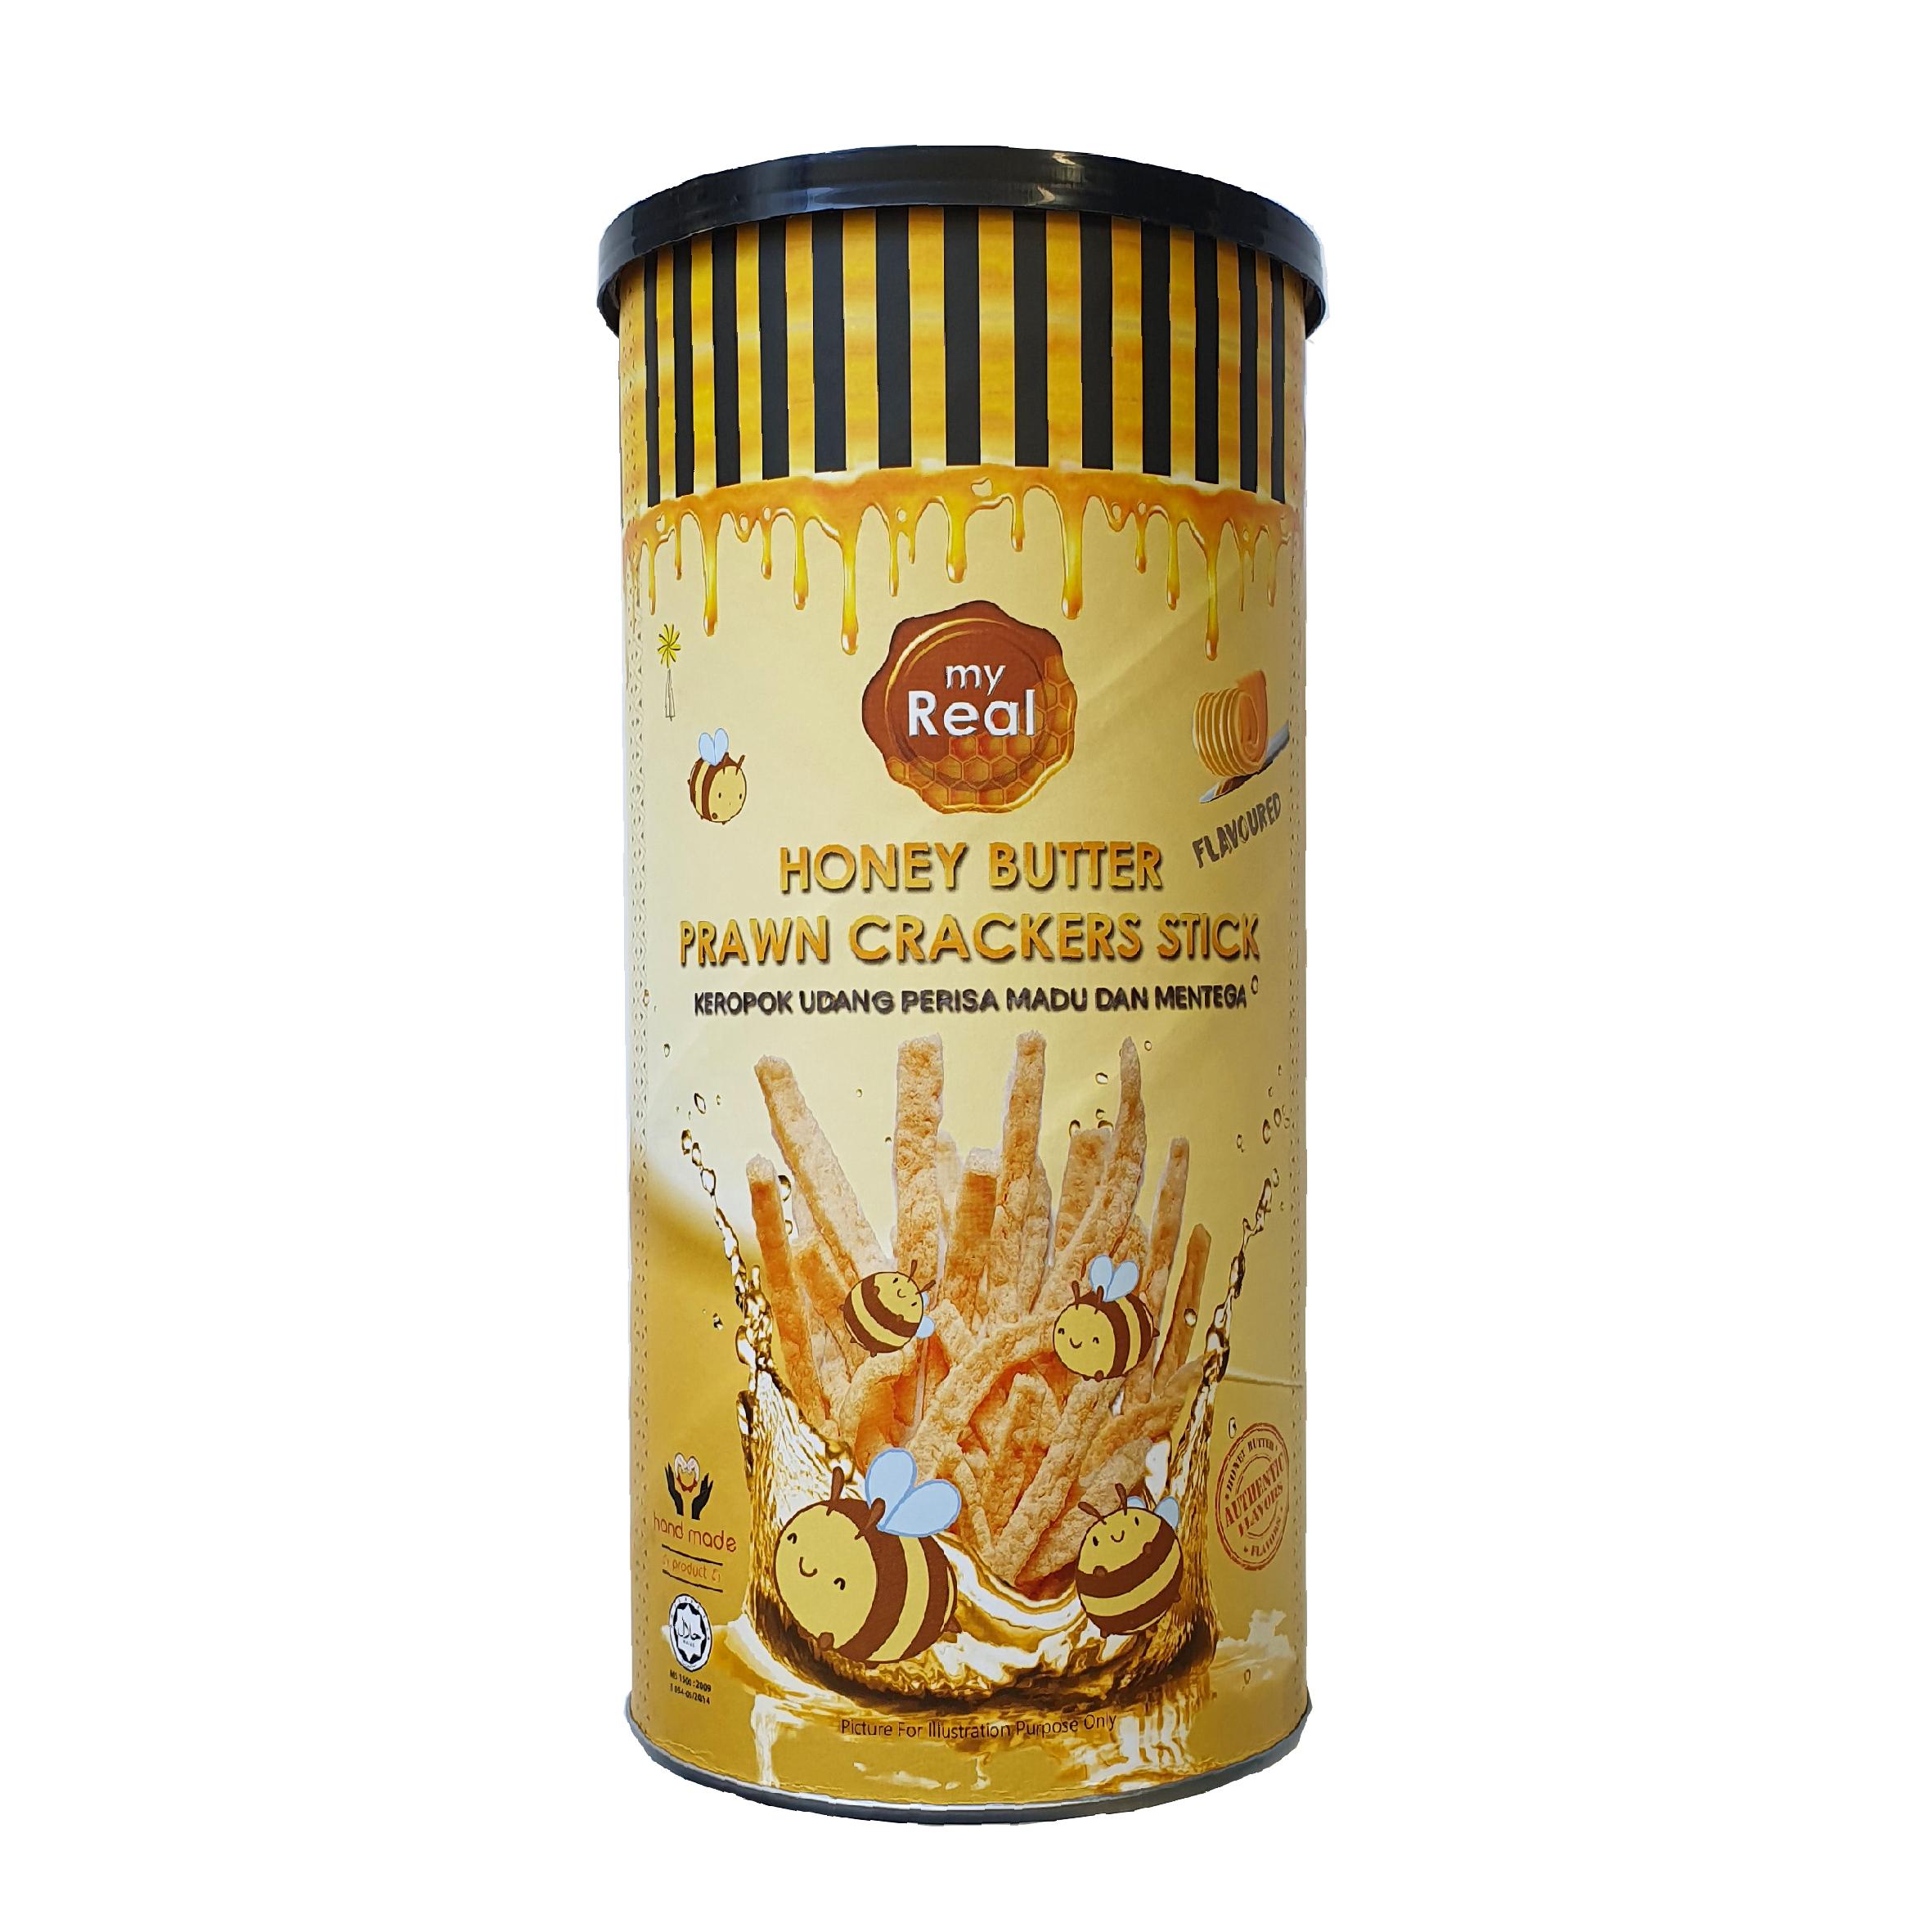 myReal Honey Butter Prawn Crackers Stick 100g